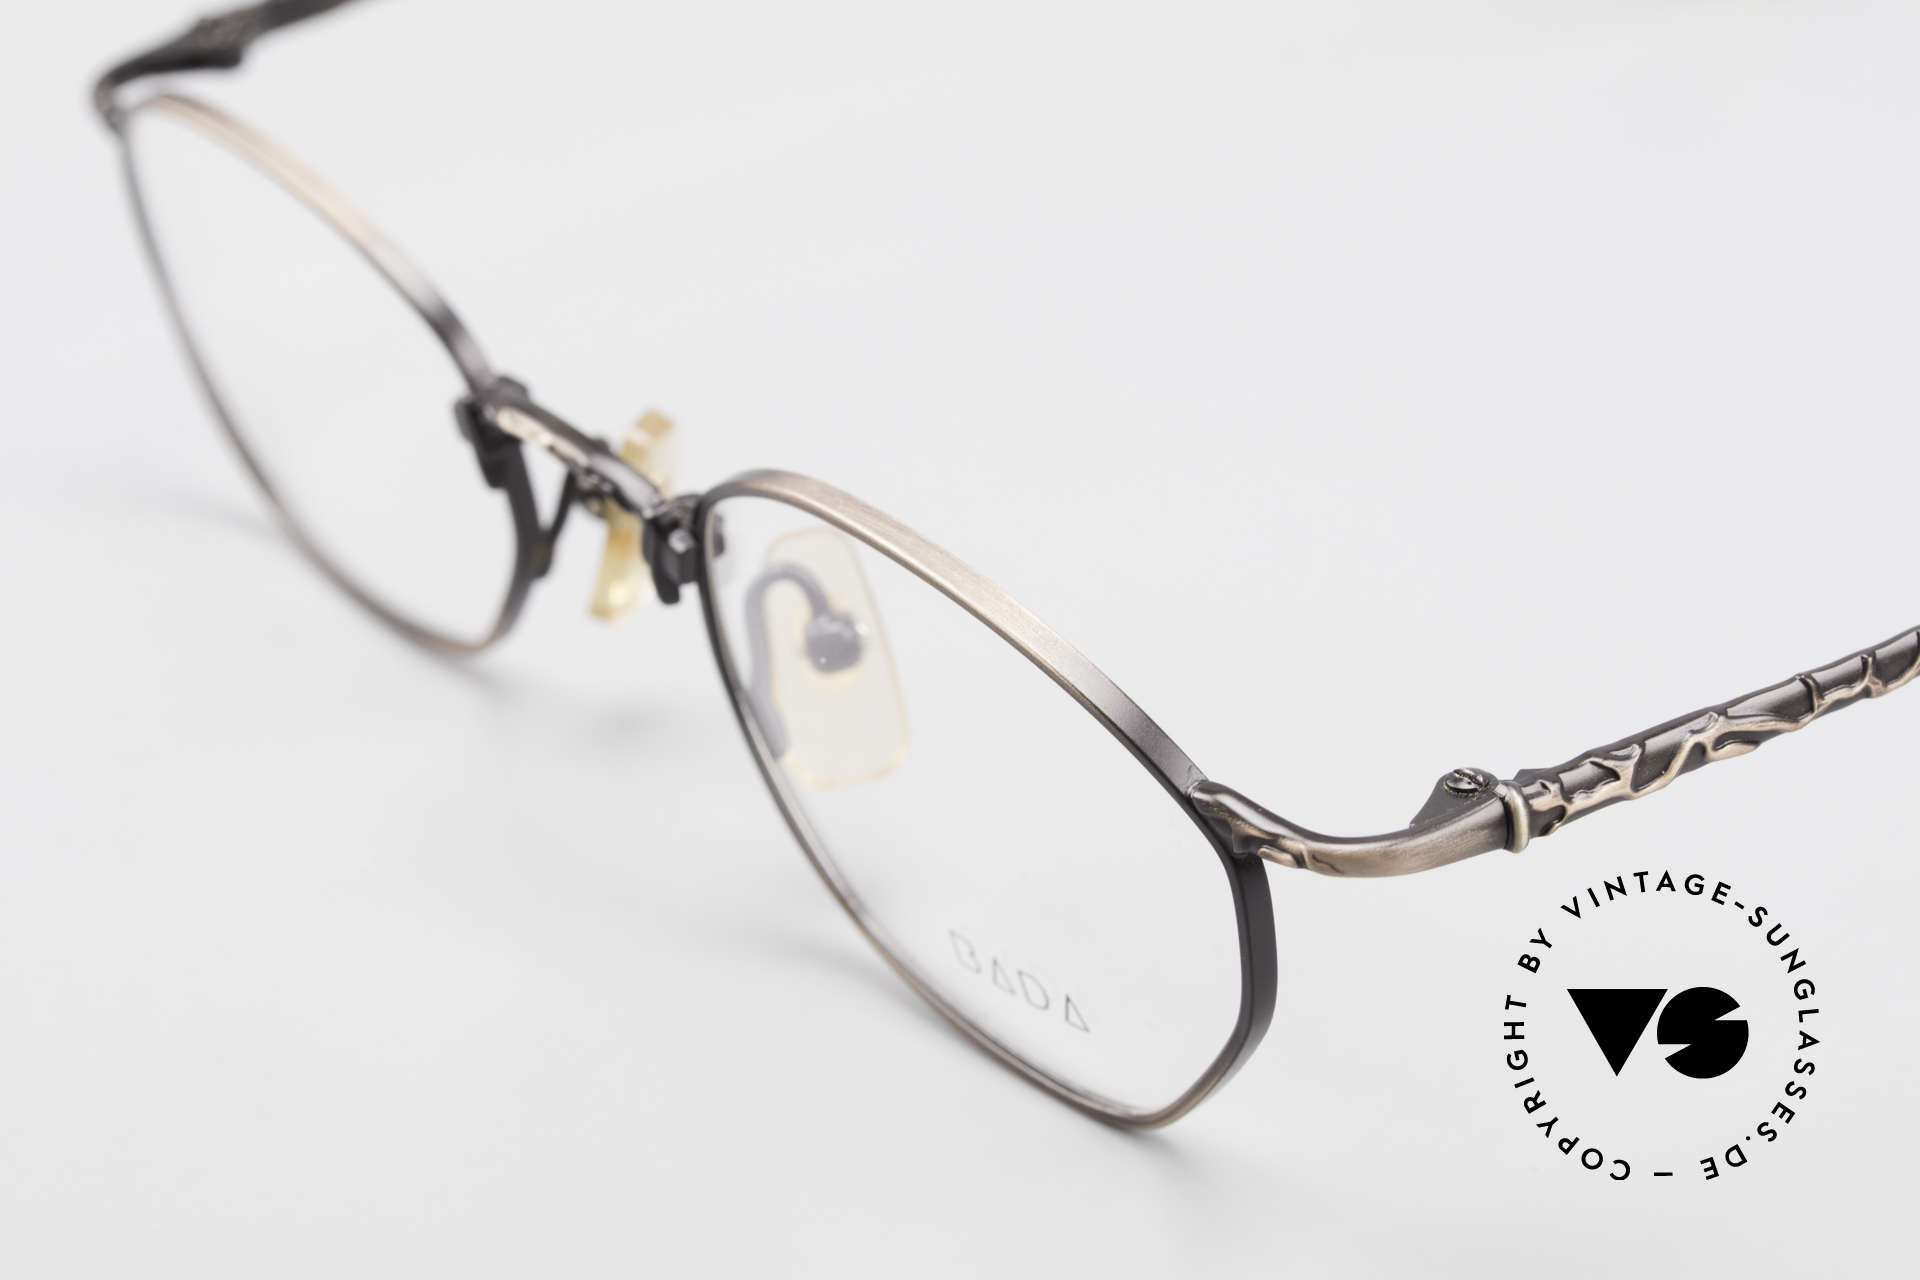 Bada BL1353 Oliver Peoples Eyevan Style, unworn, NOS (like all our old L.A.+ Sabae eyeglasses), Made for Men and Women